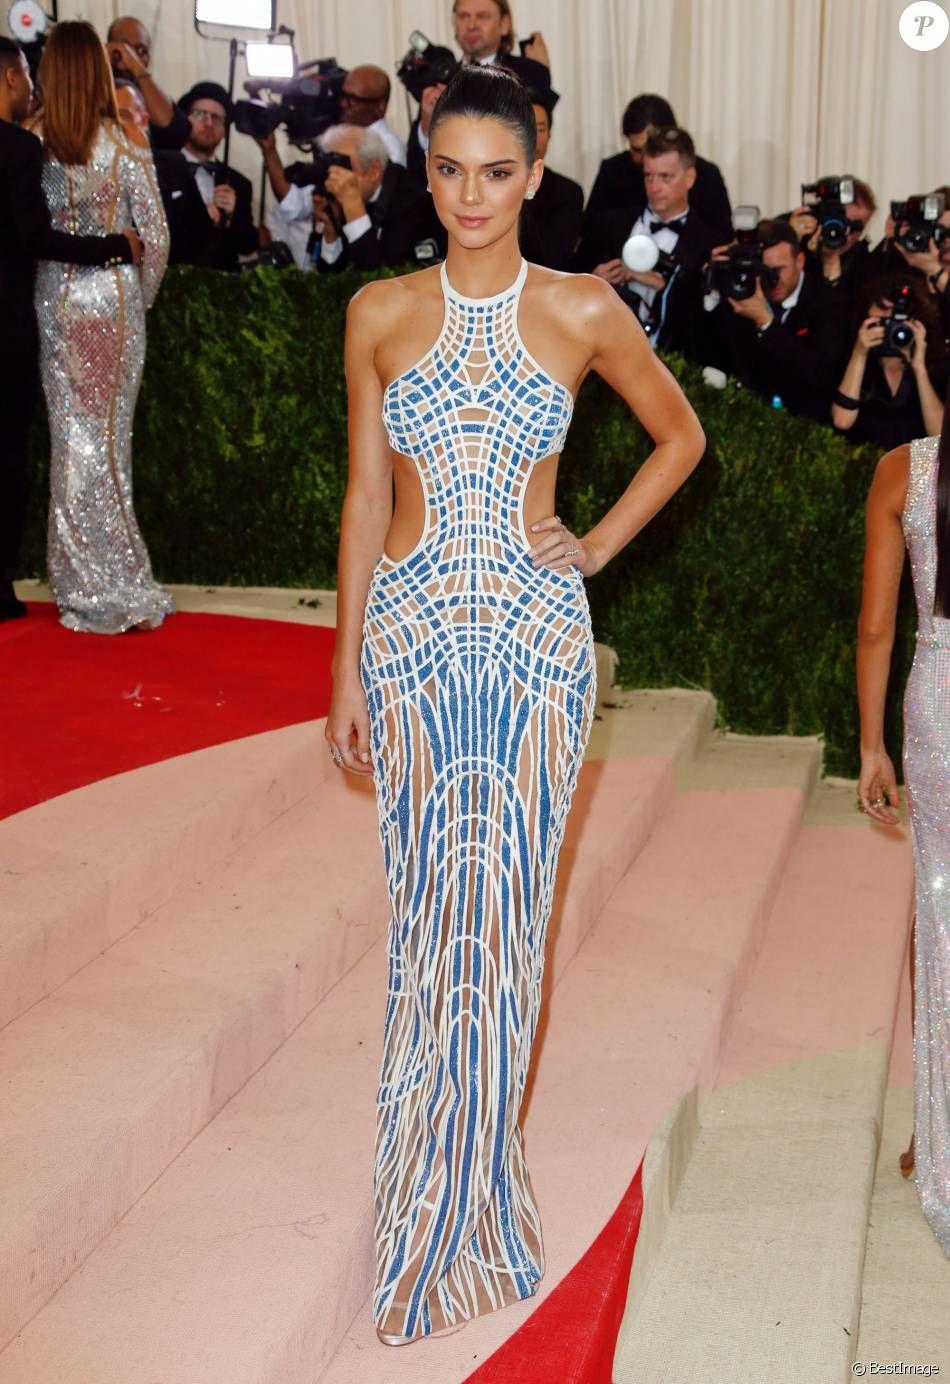 PHOTOS - Kendall Jenner - Soirée Costume Institute Benefit ...